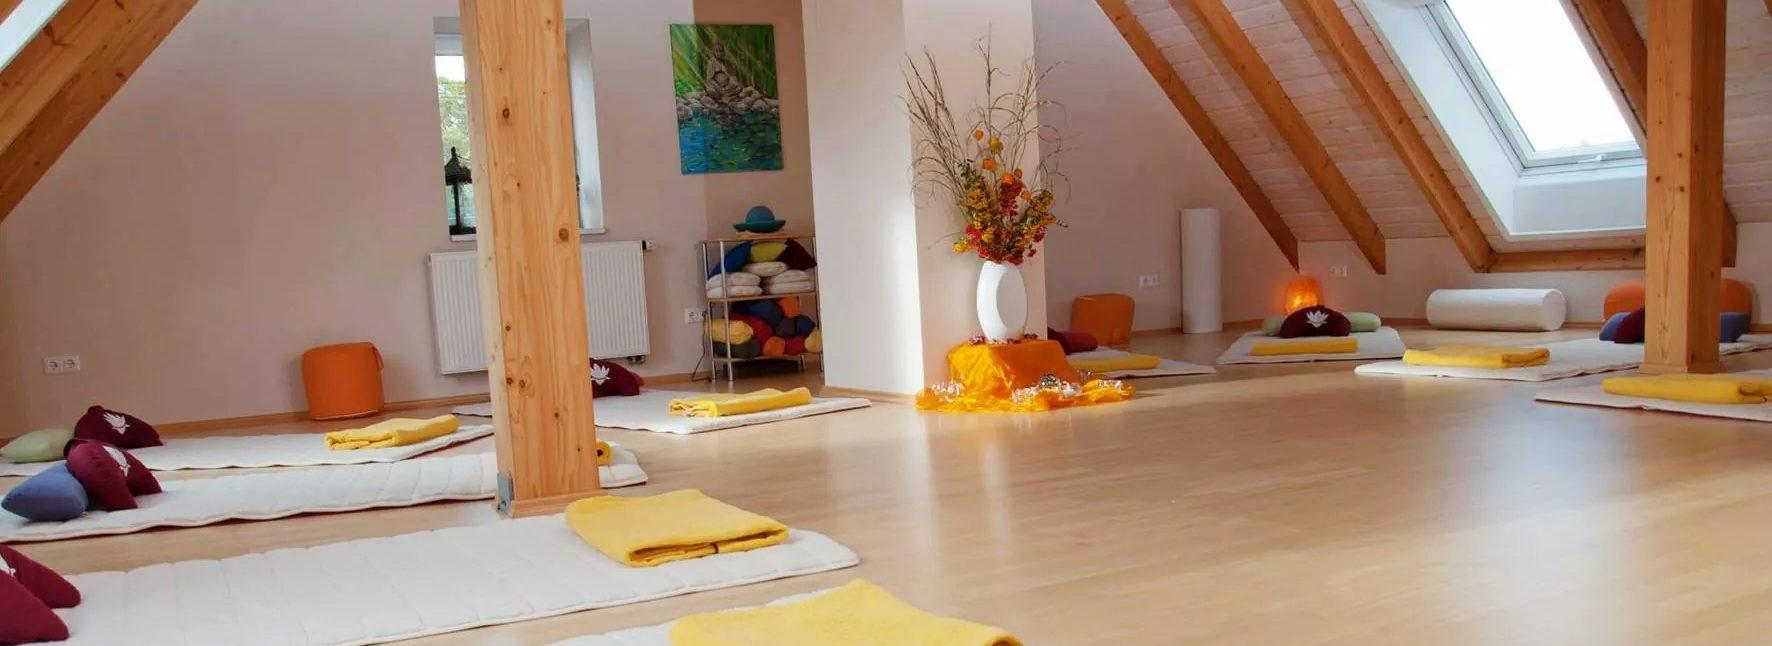 Jutta K. Ditzel – Praxis für Yoga und Meditation